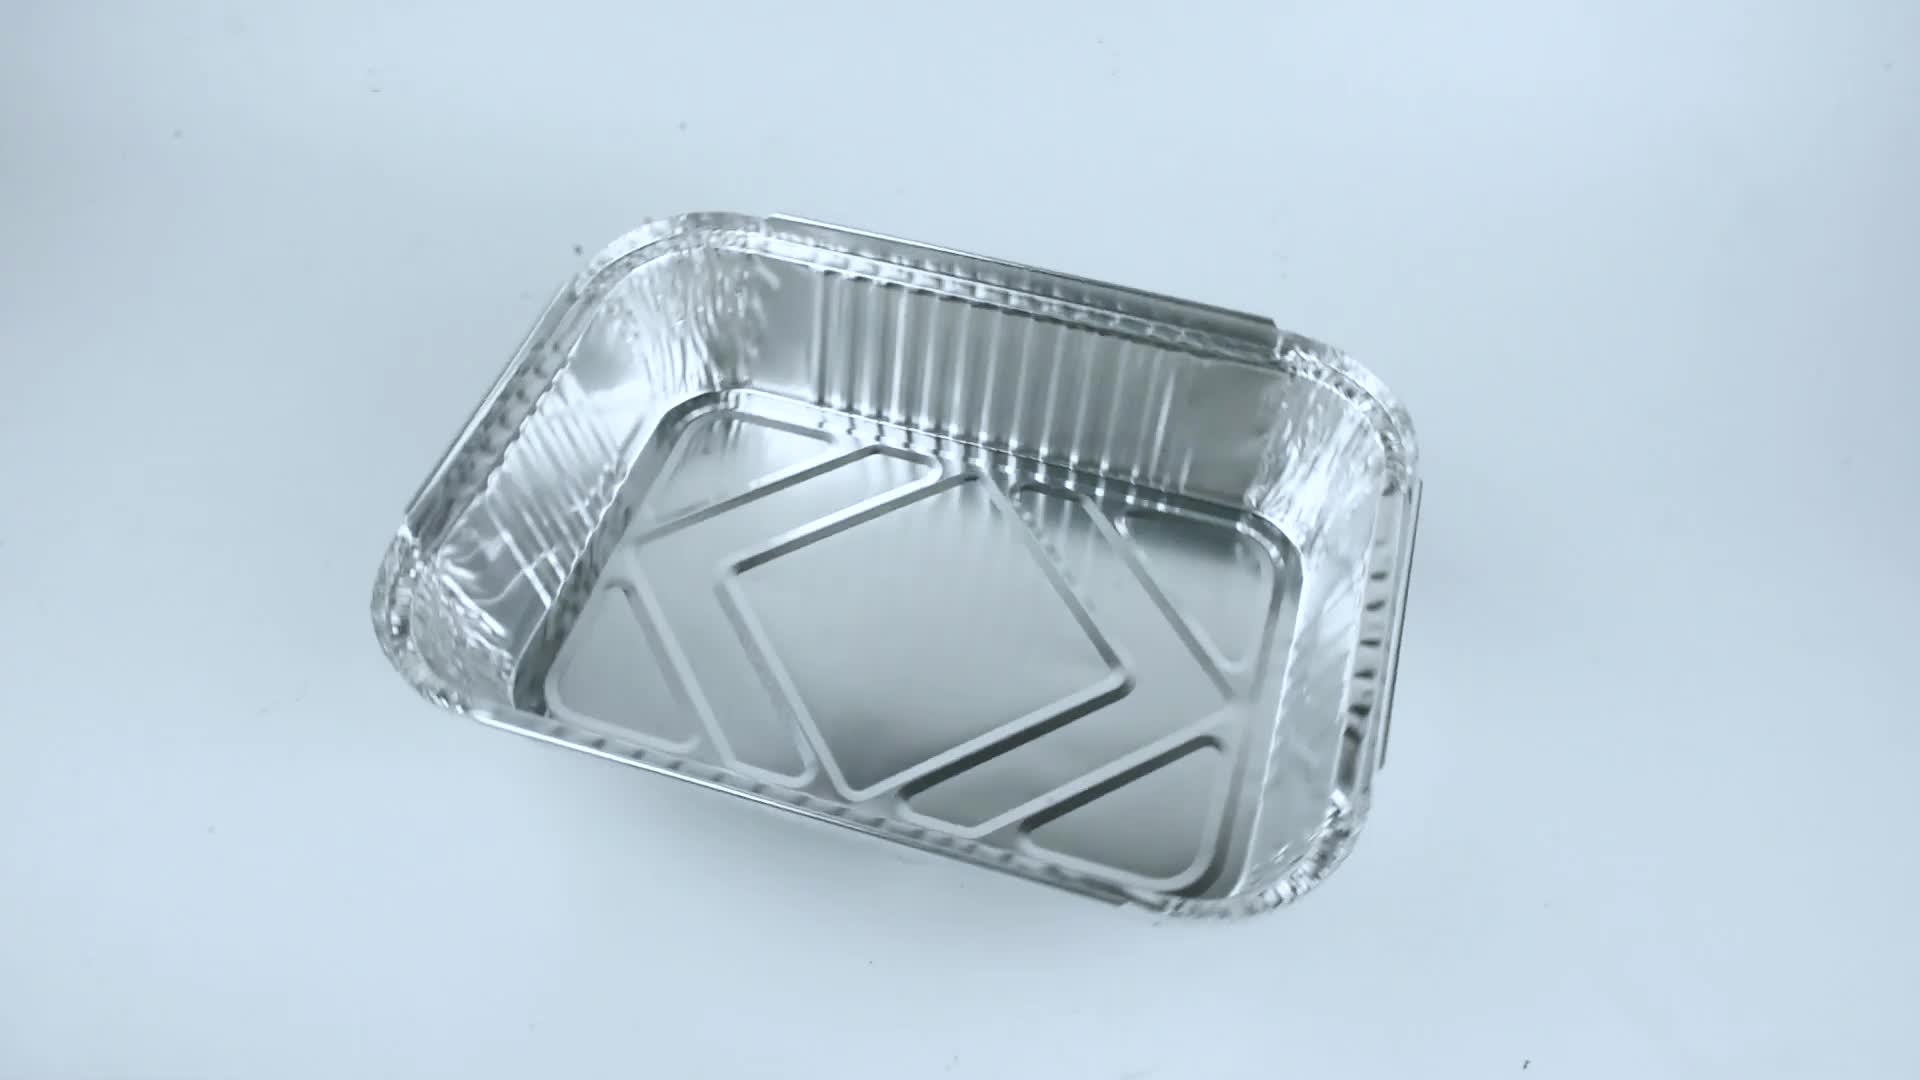 10 ''X 7.5'' X 2.5 ''ทิ้ง Heavy Duty หนาอลูมิเนียมฟอยล์อาหารกระทะพร้อมฝาปิดบอร์ดสำหรับทำอาหารย่างเบเกอรี่